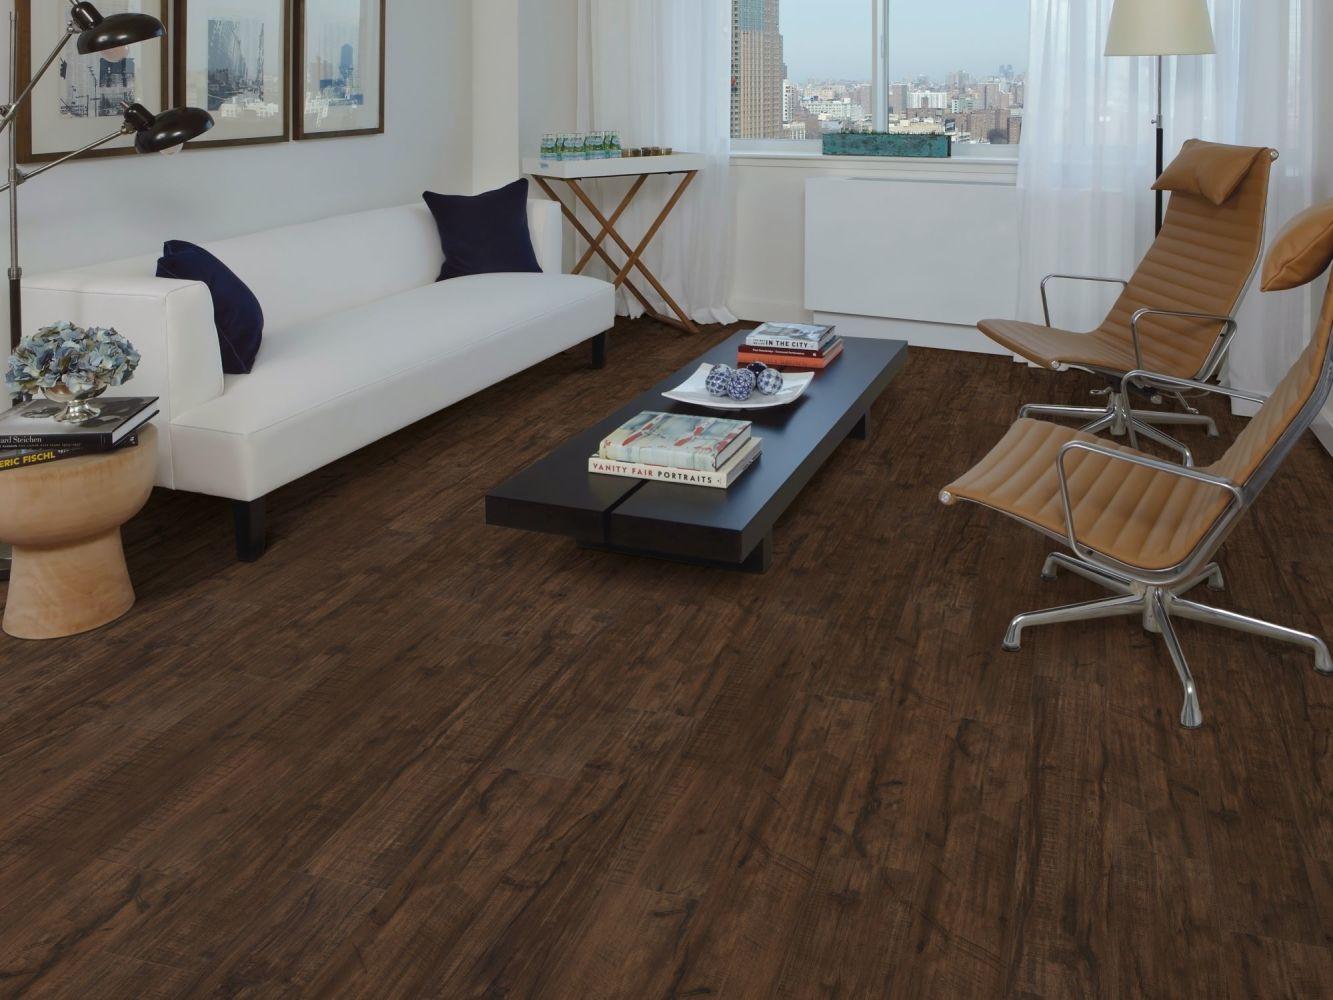 Shaw Floors Reality Homes Rialto Beach Umber Oak 00734_102RH